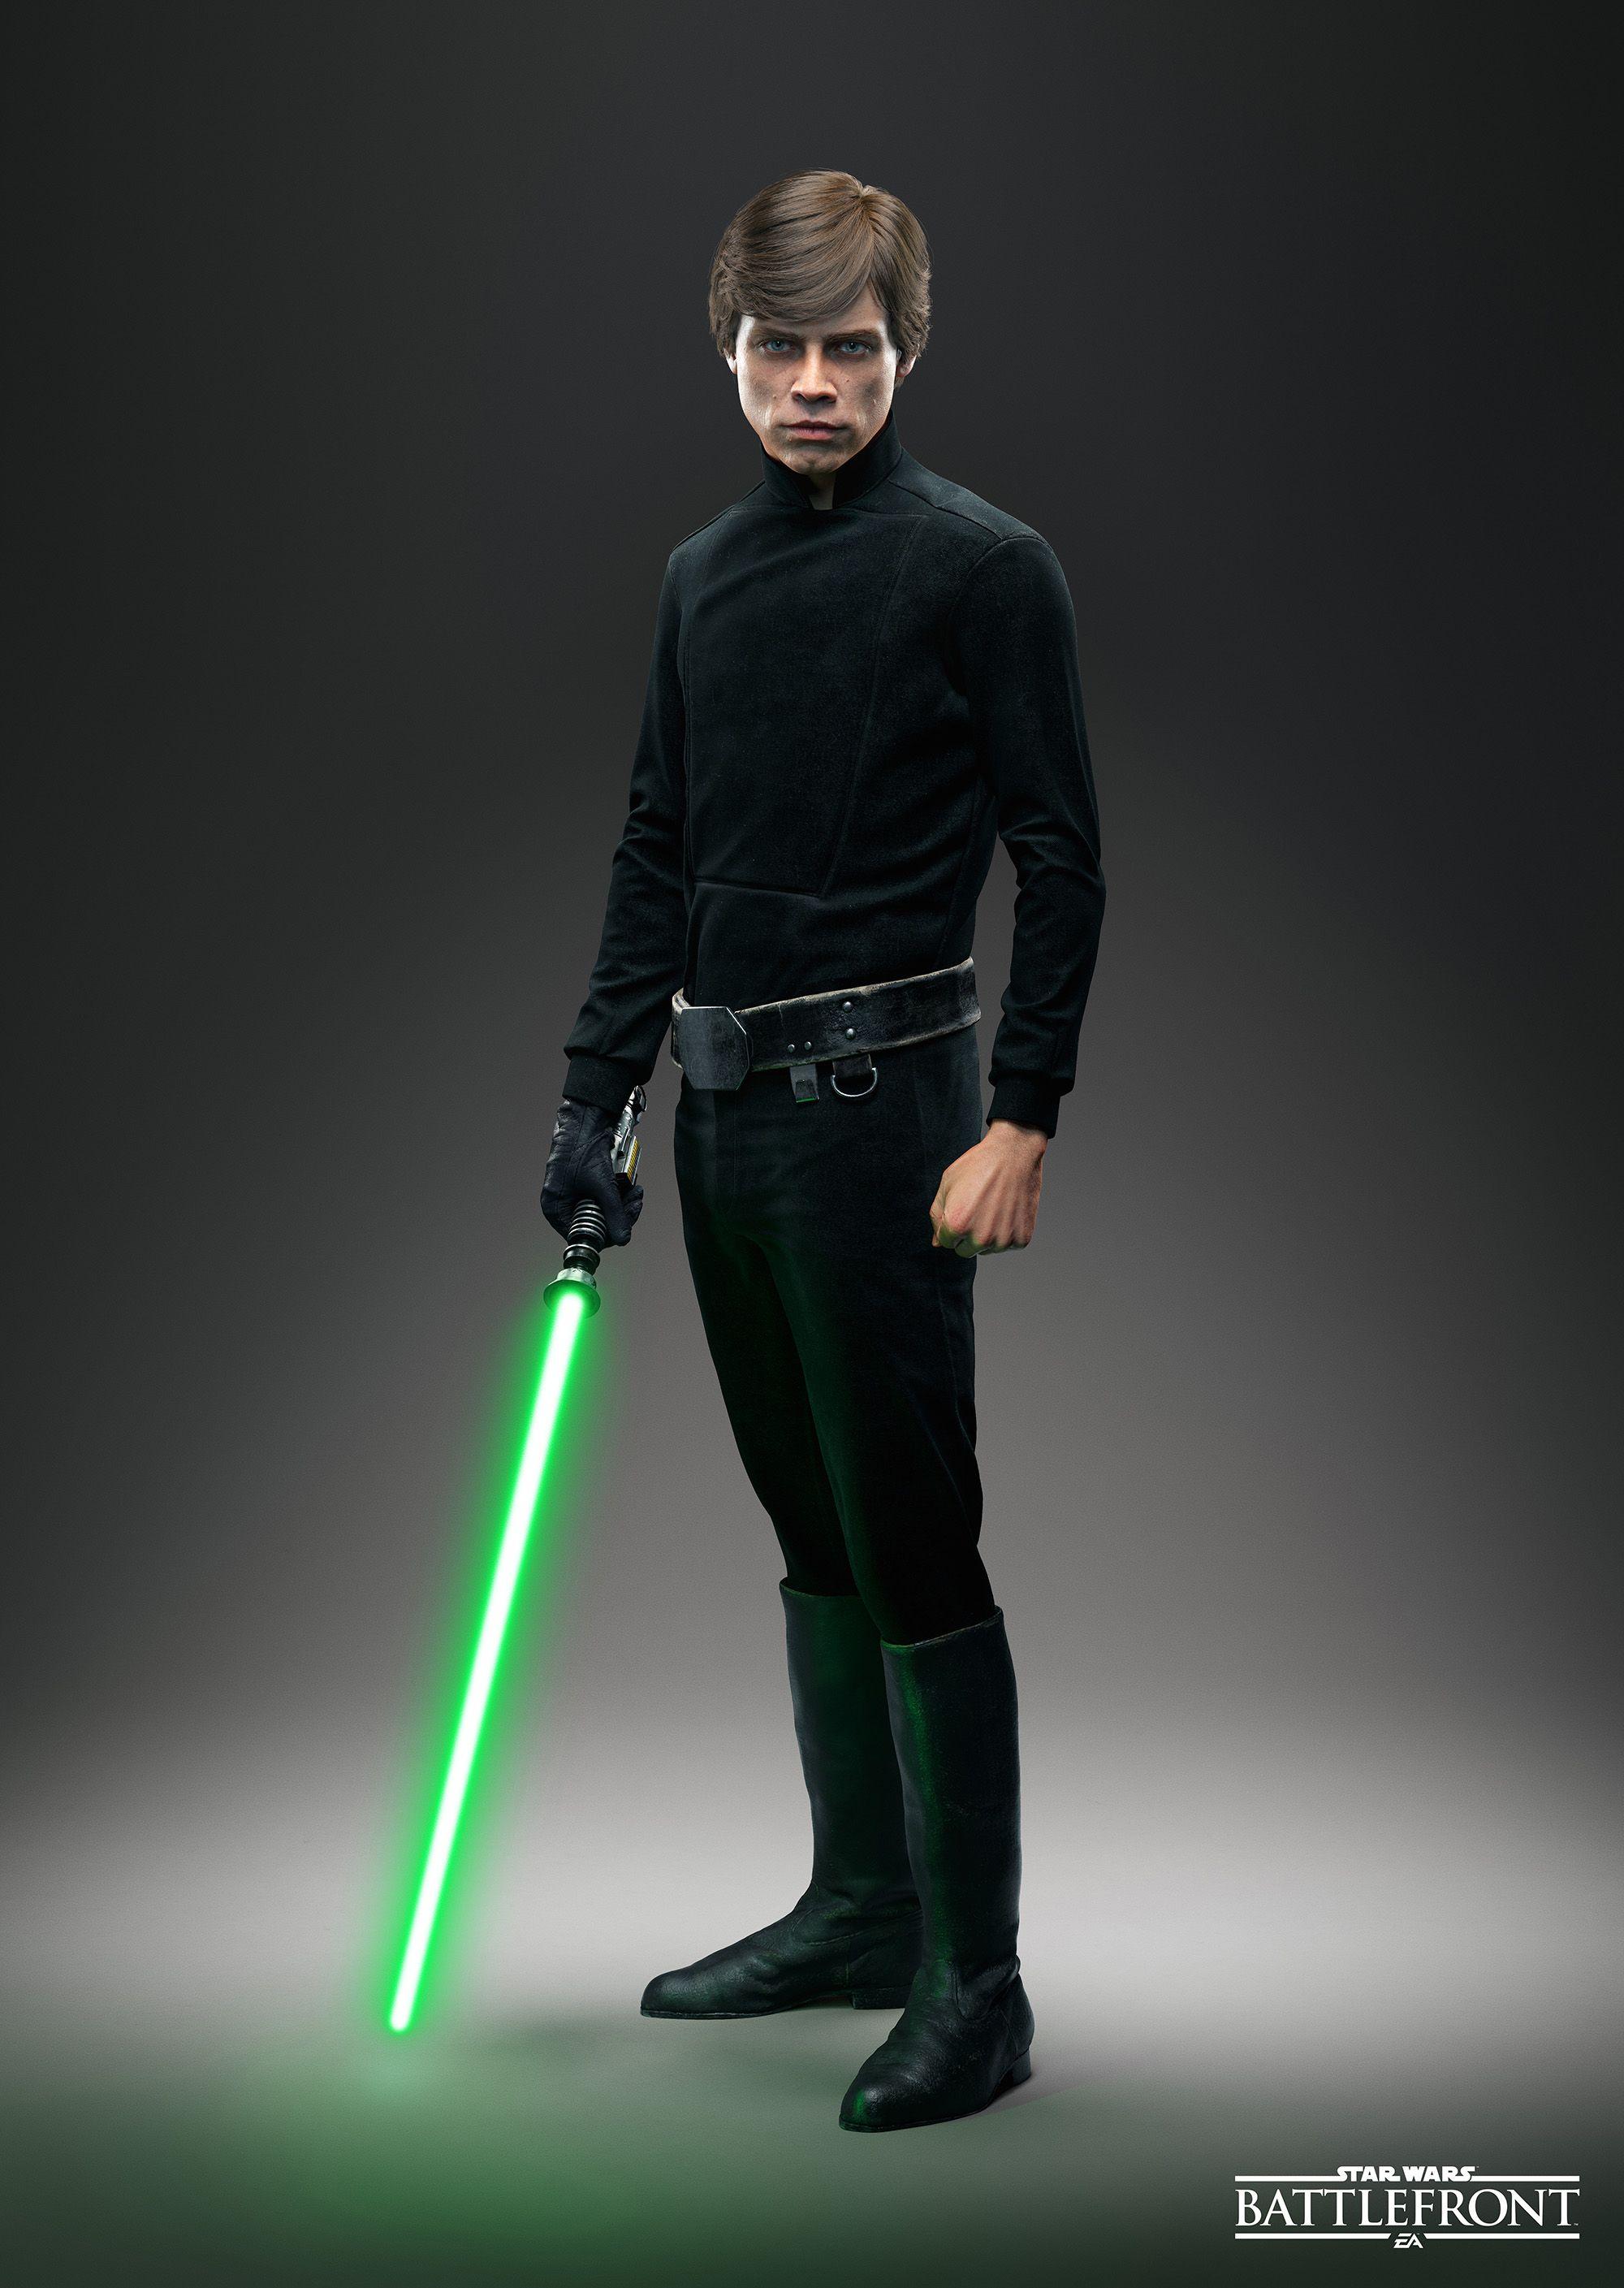 luke skywalker | star wars battlefront - character renders | pinterest